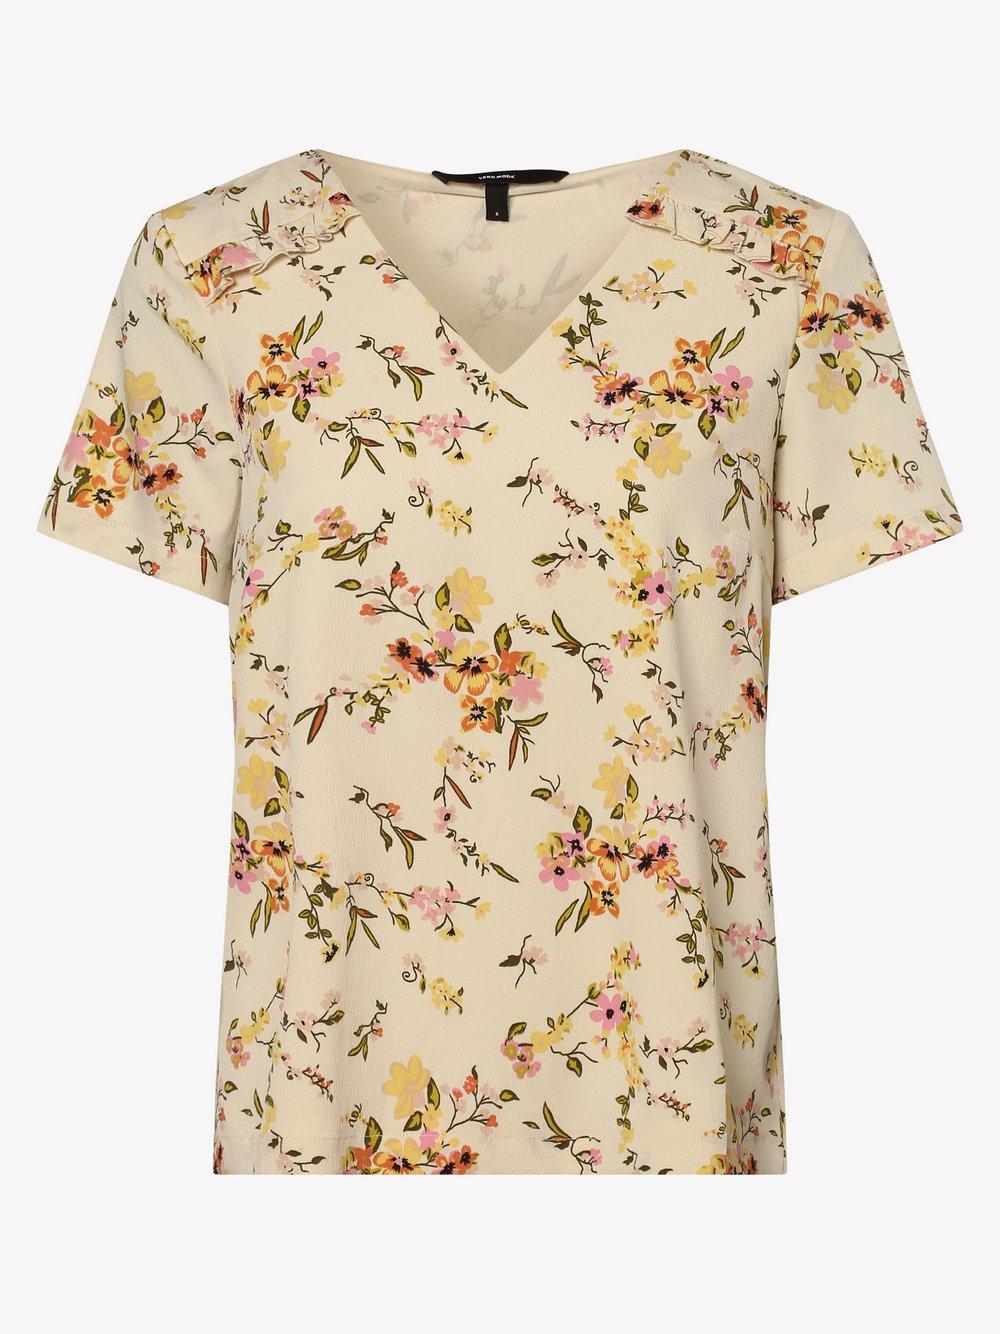 Vero Moda – Bluzka damska – Vmkissey, beżowy Van Graaf 469124-0001-09920